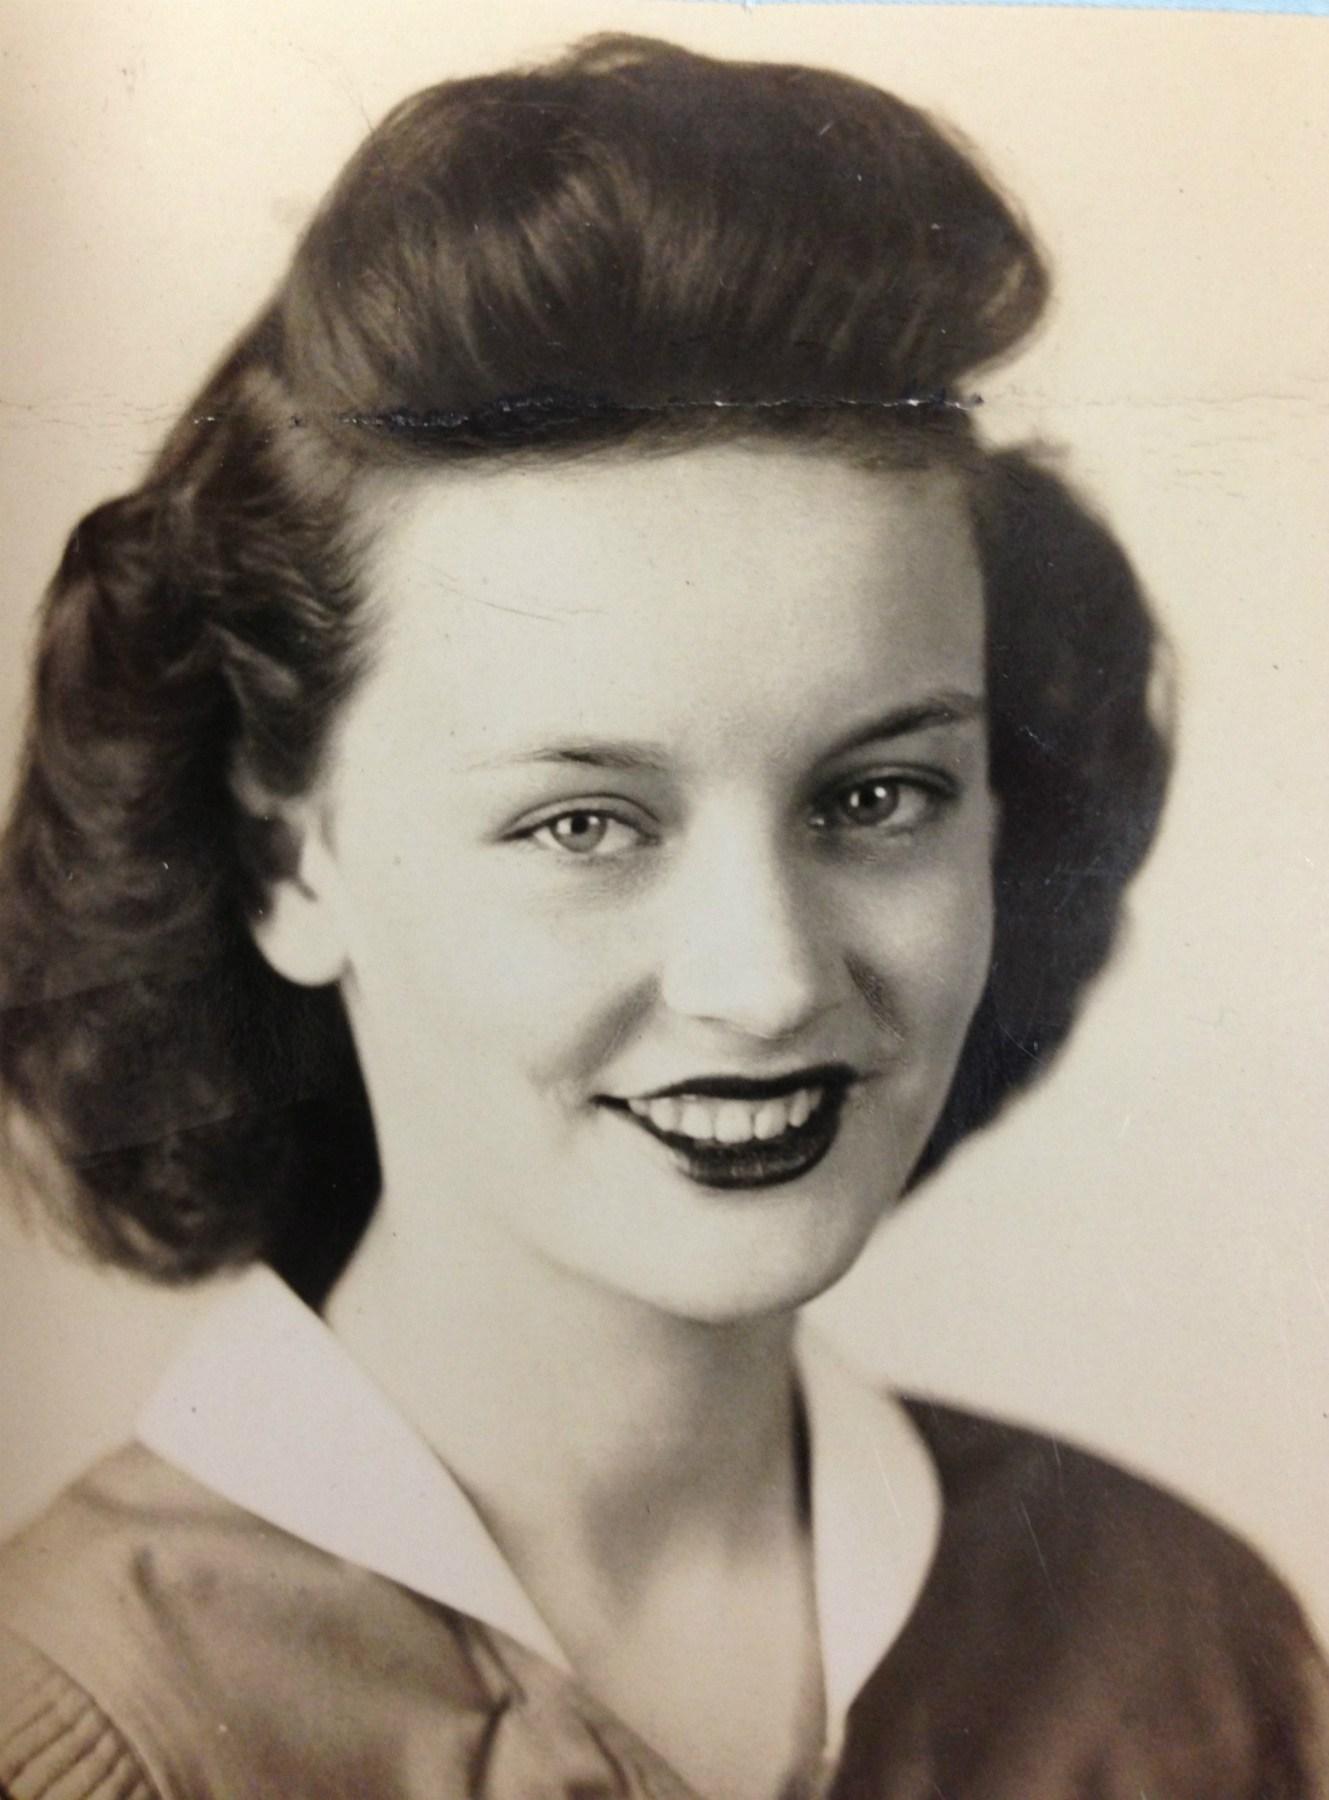 Betty Smith avis de décès - Houston, TX